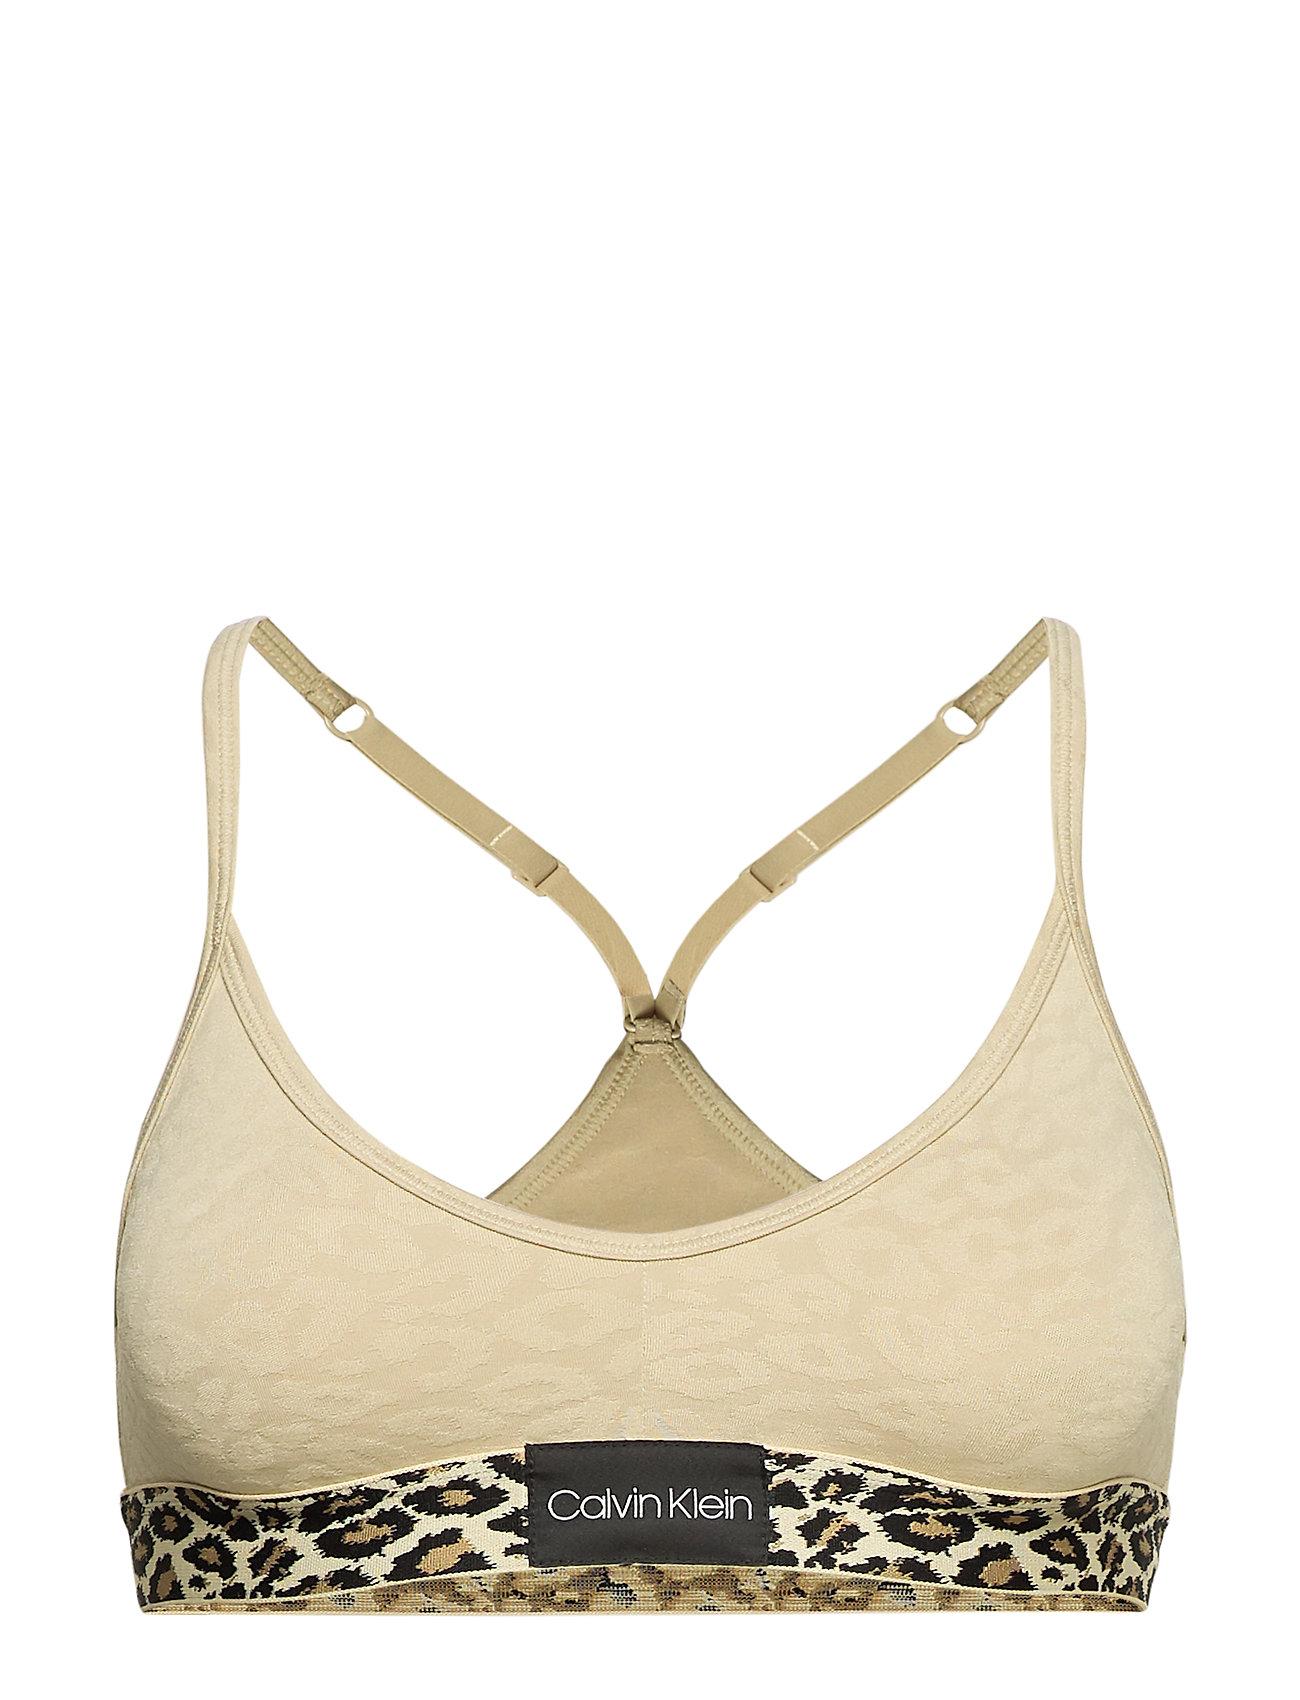 Calvin Klein UNLINED BRALETTE, 7V - OXFORD TAN